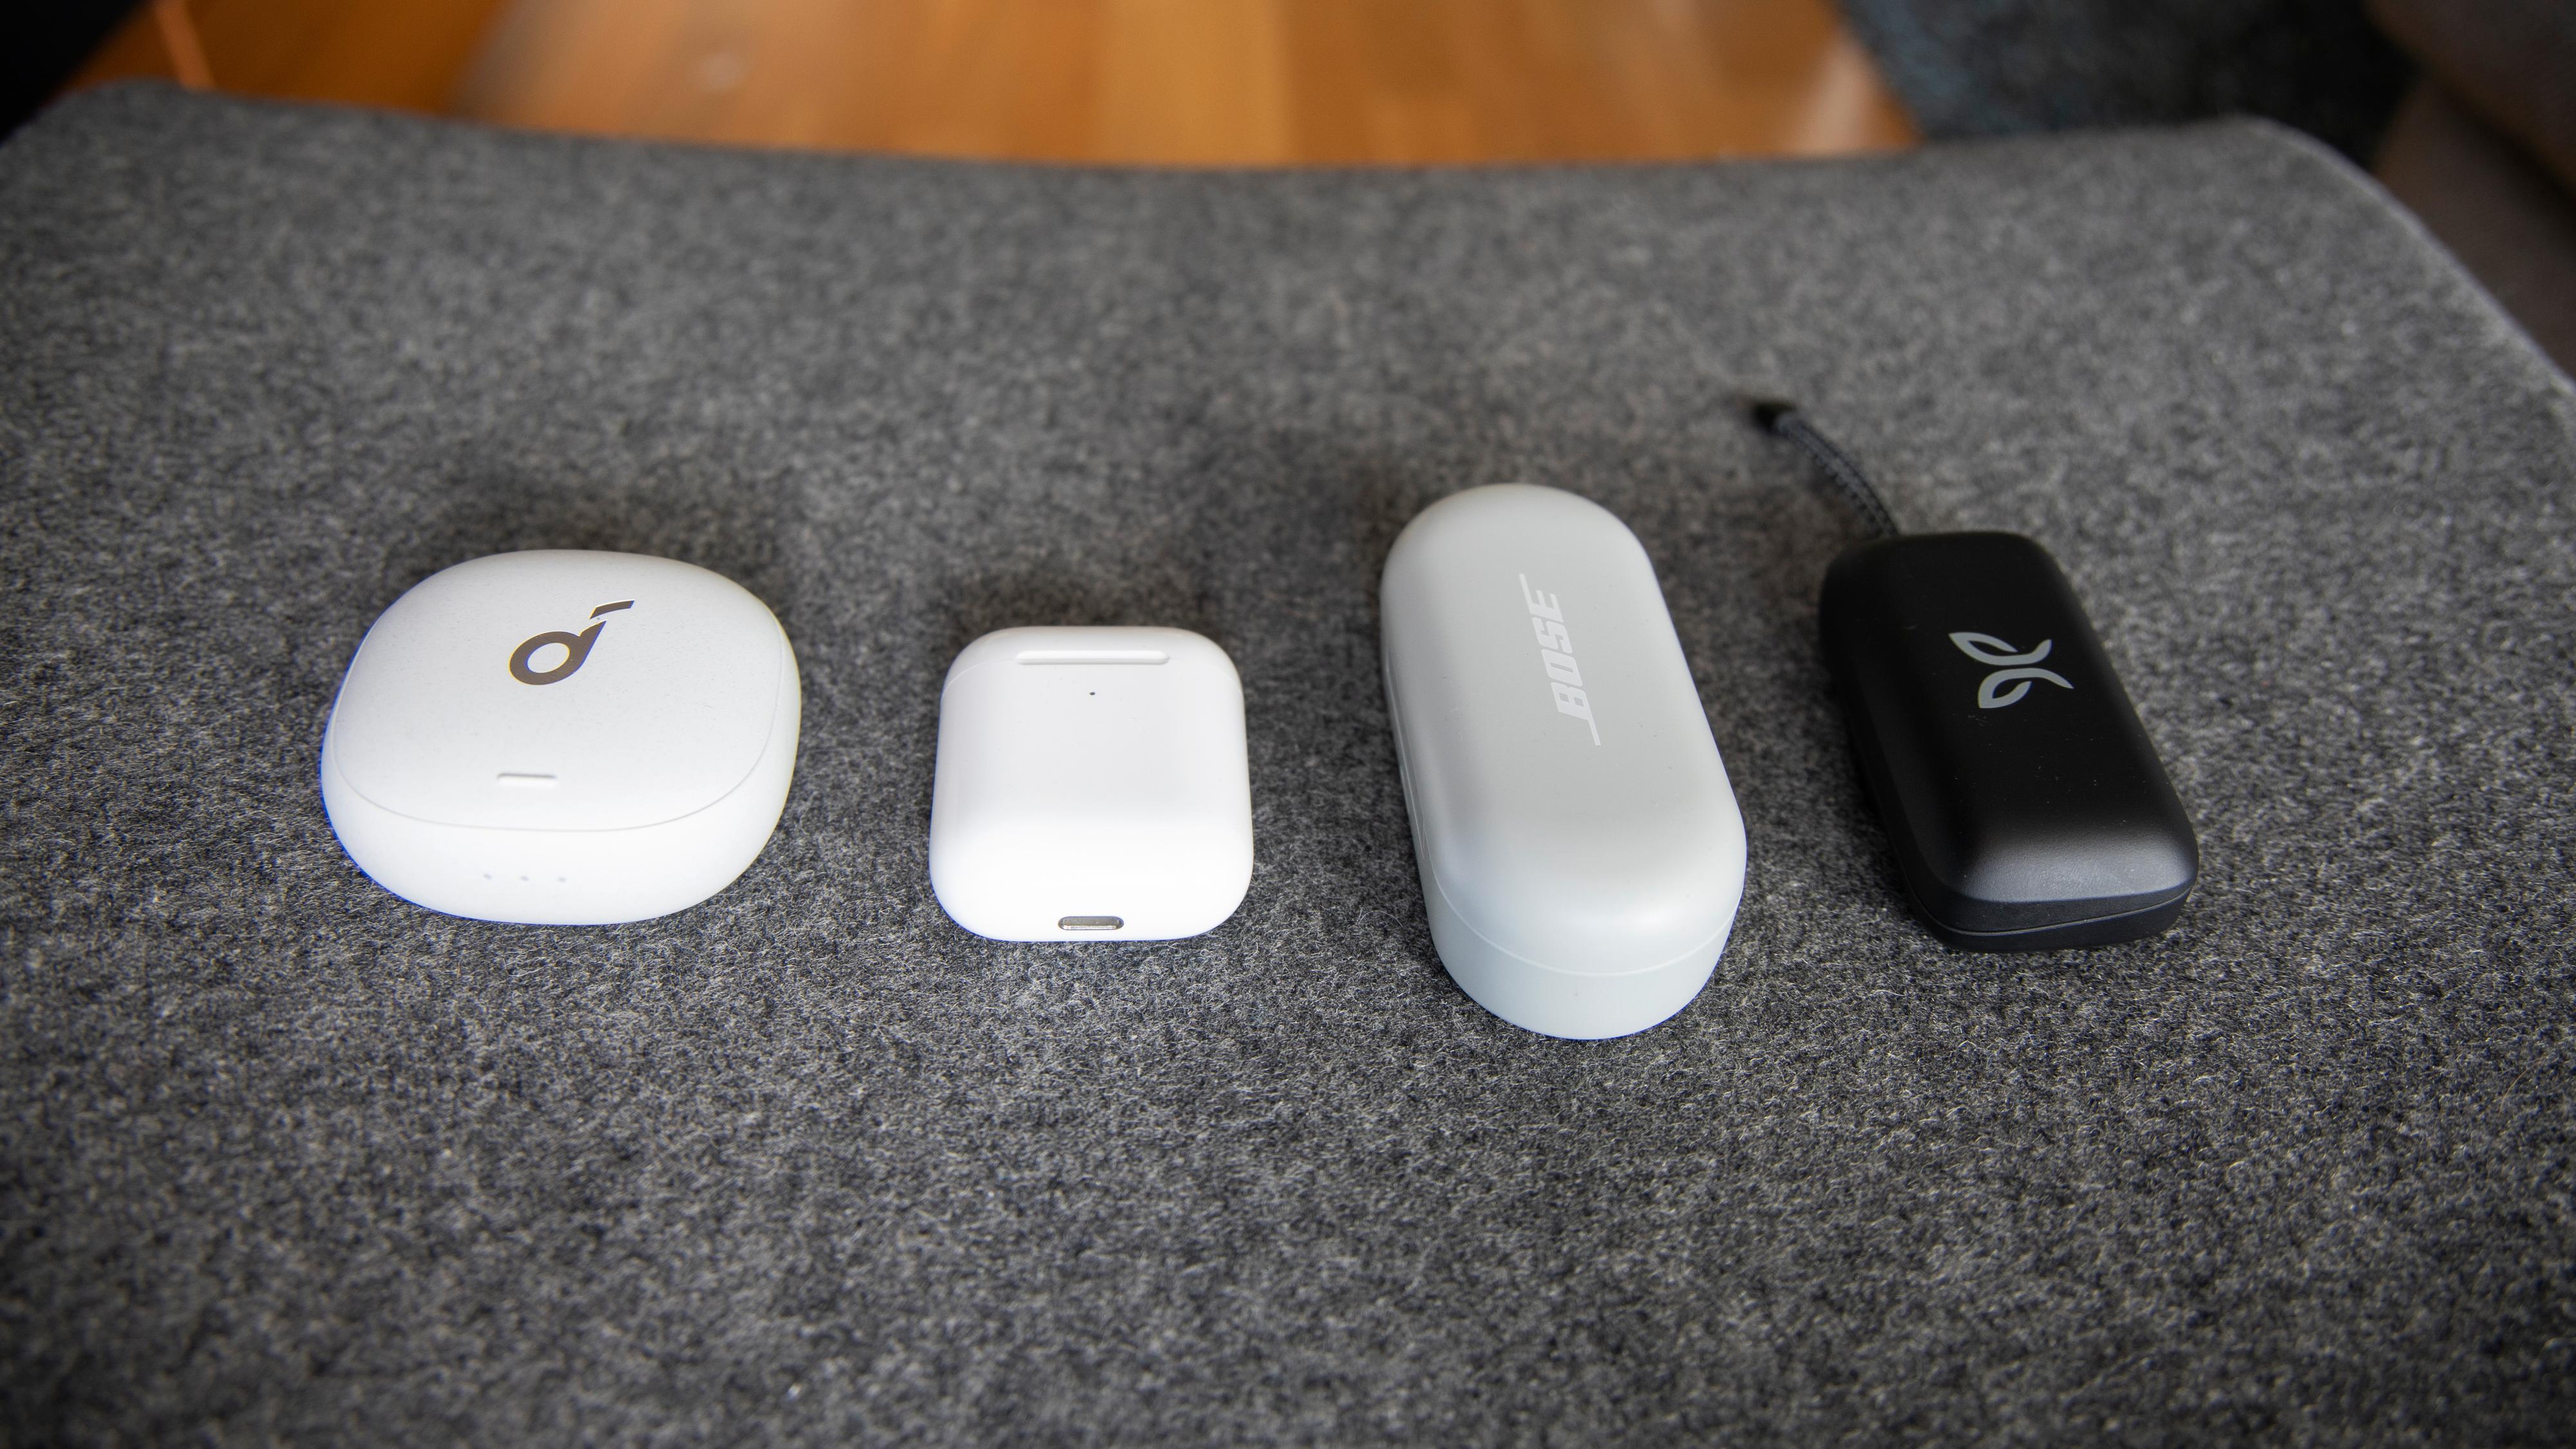 Fra venstre mot høyre: Soundcore Liberty Air 2 Pro, Apple AirPods, Bose Sport Earbuds og Jaybird Vista 2.